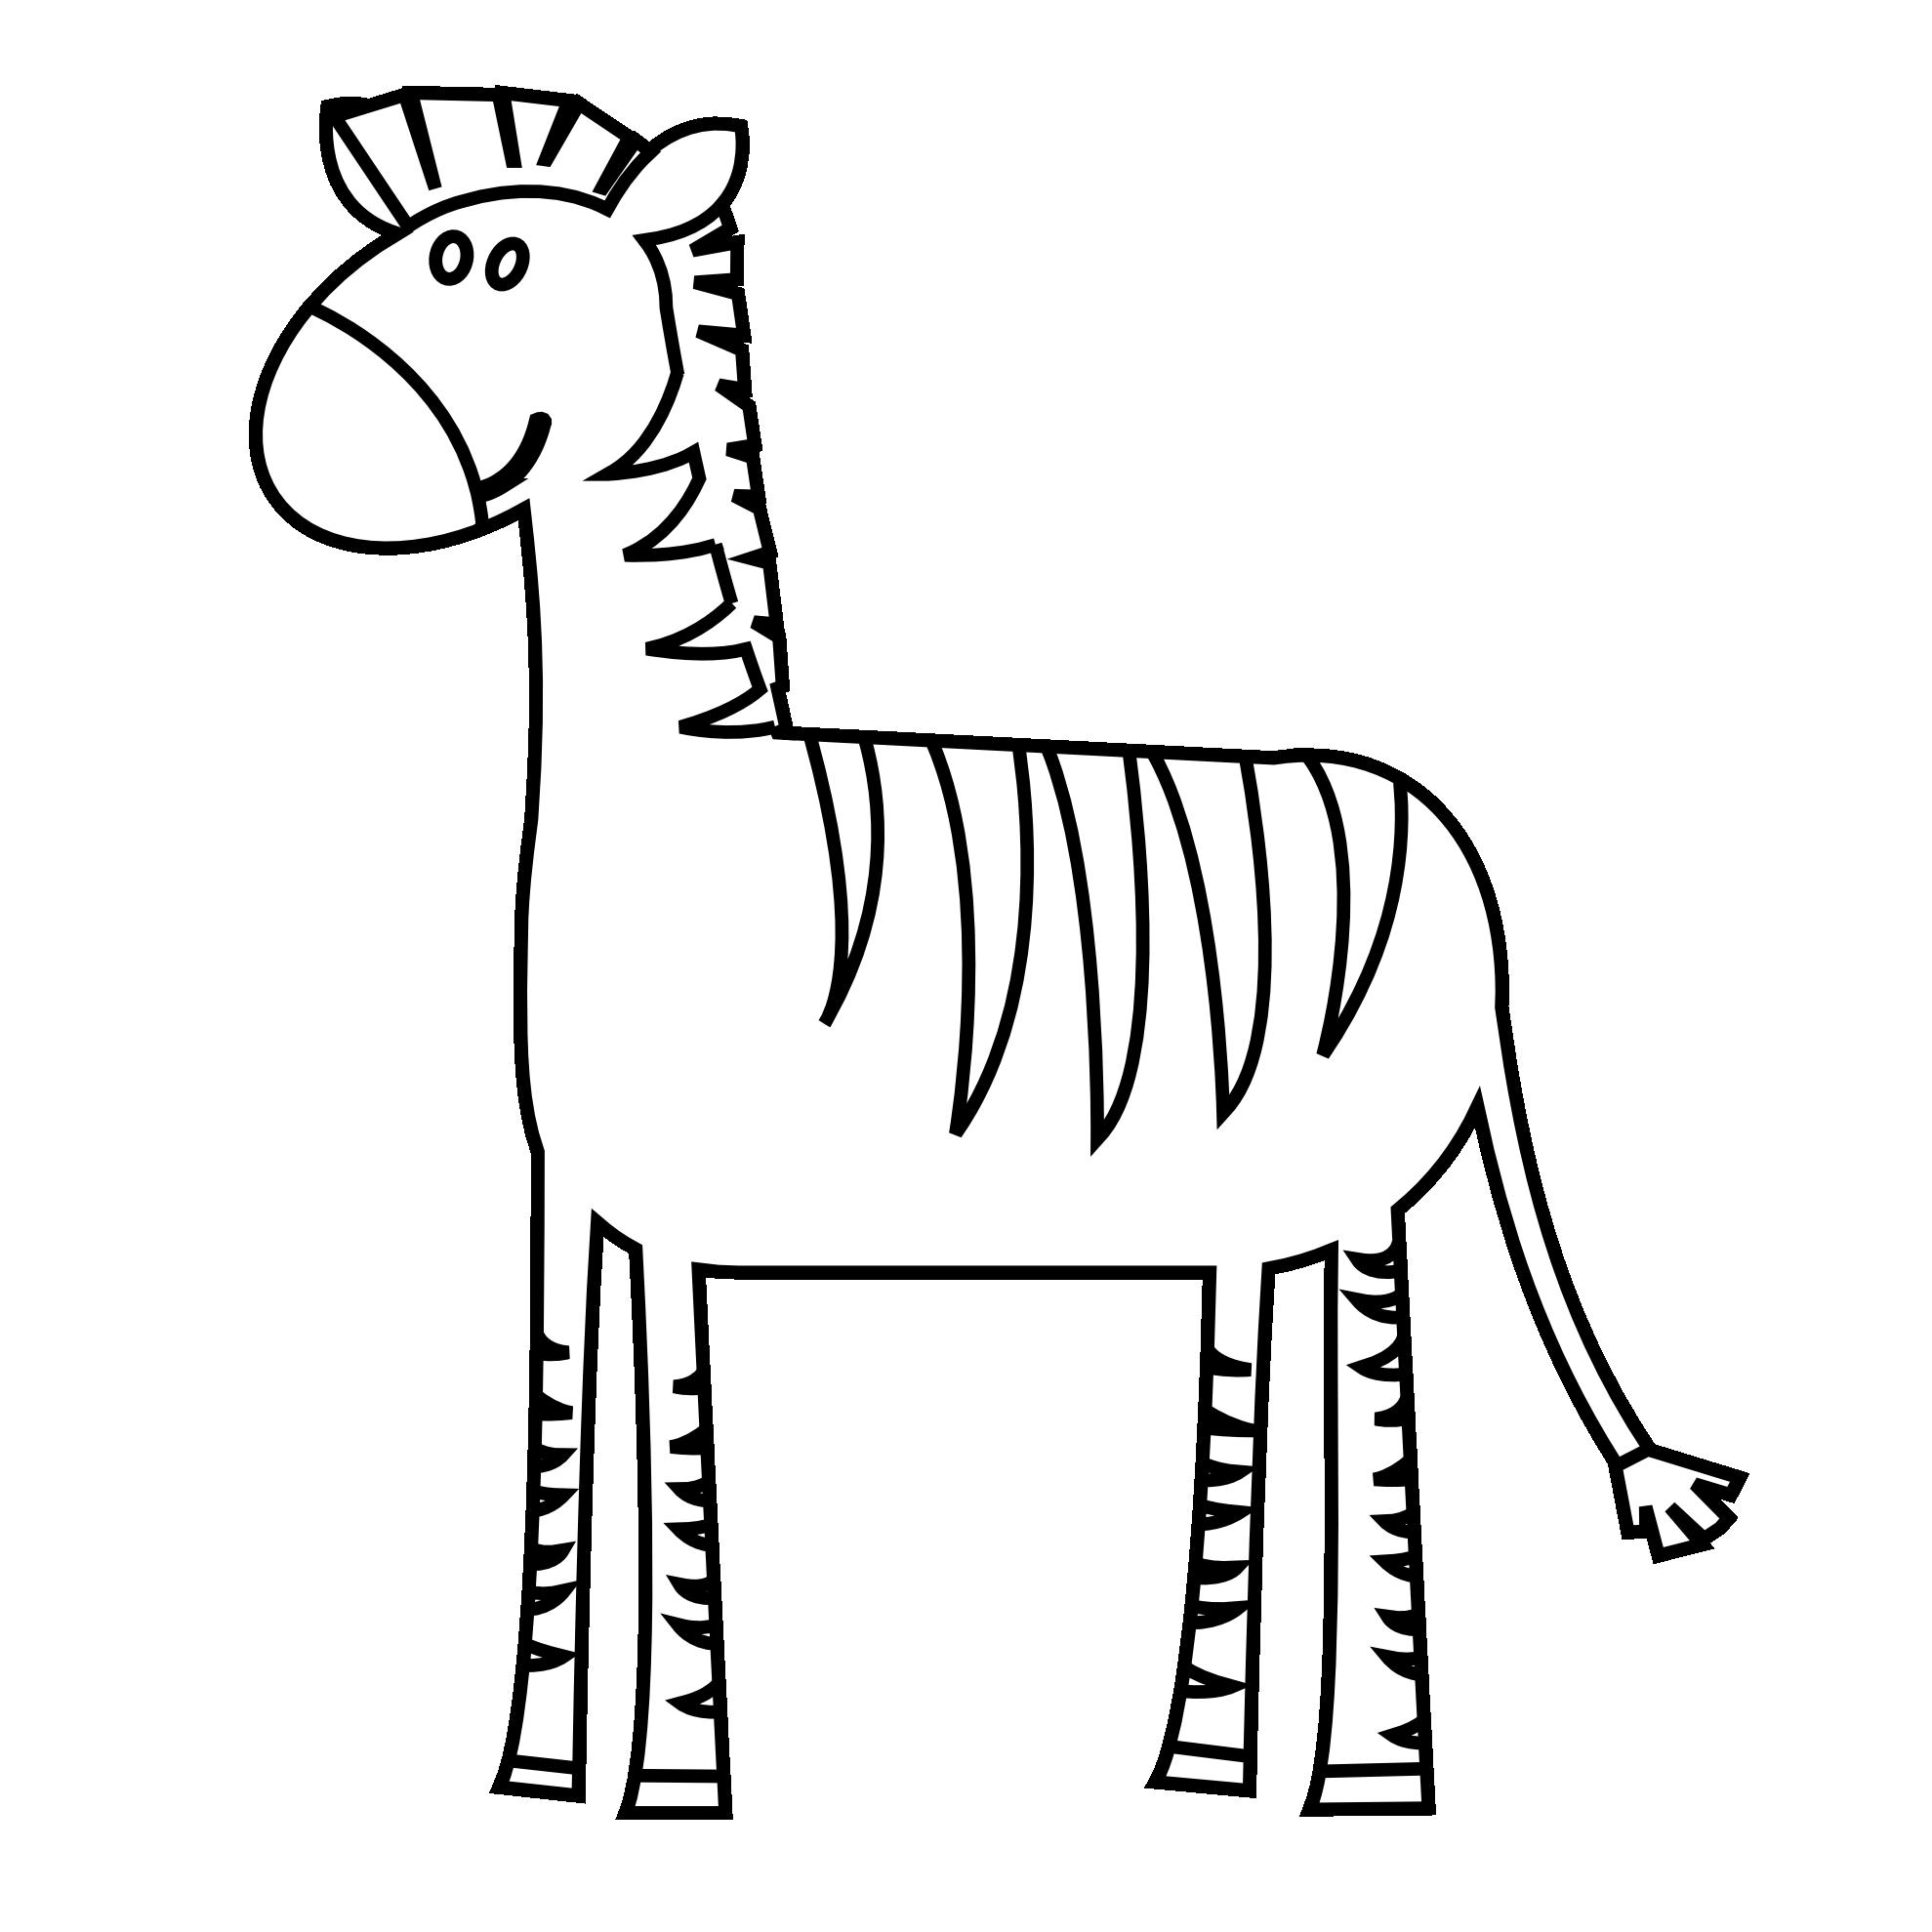 Graffiti clipart black and white.  collection of zebra